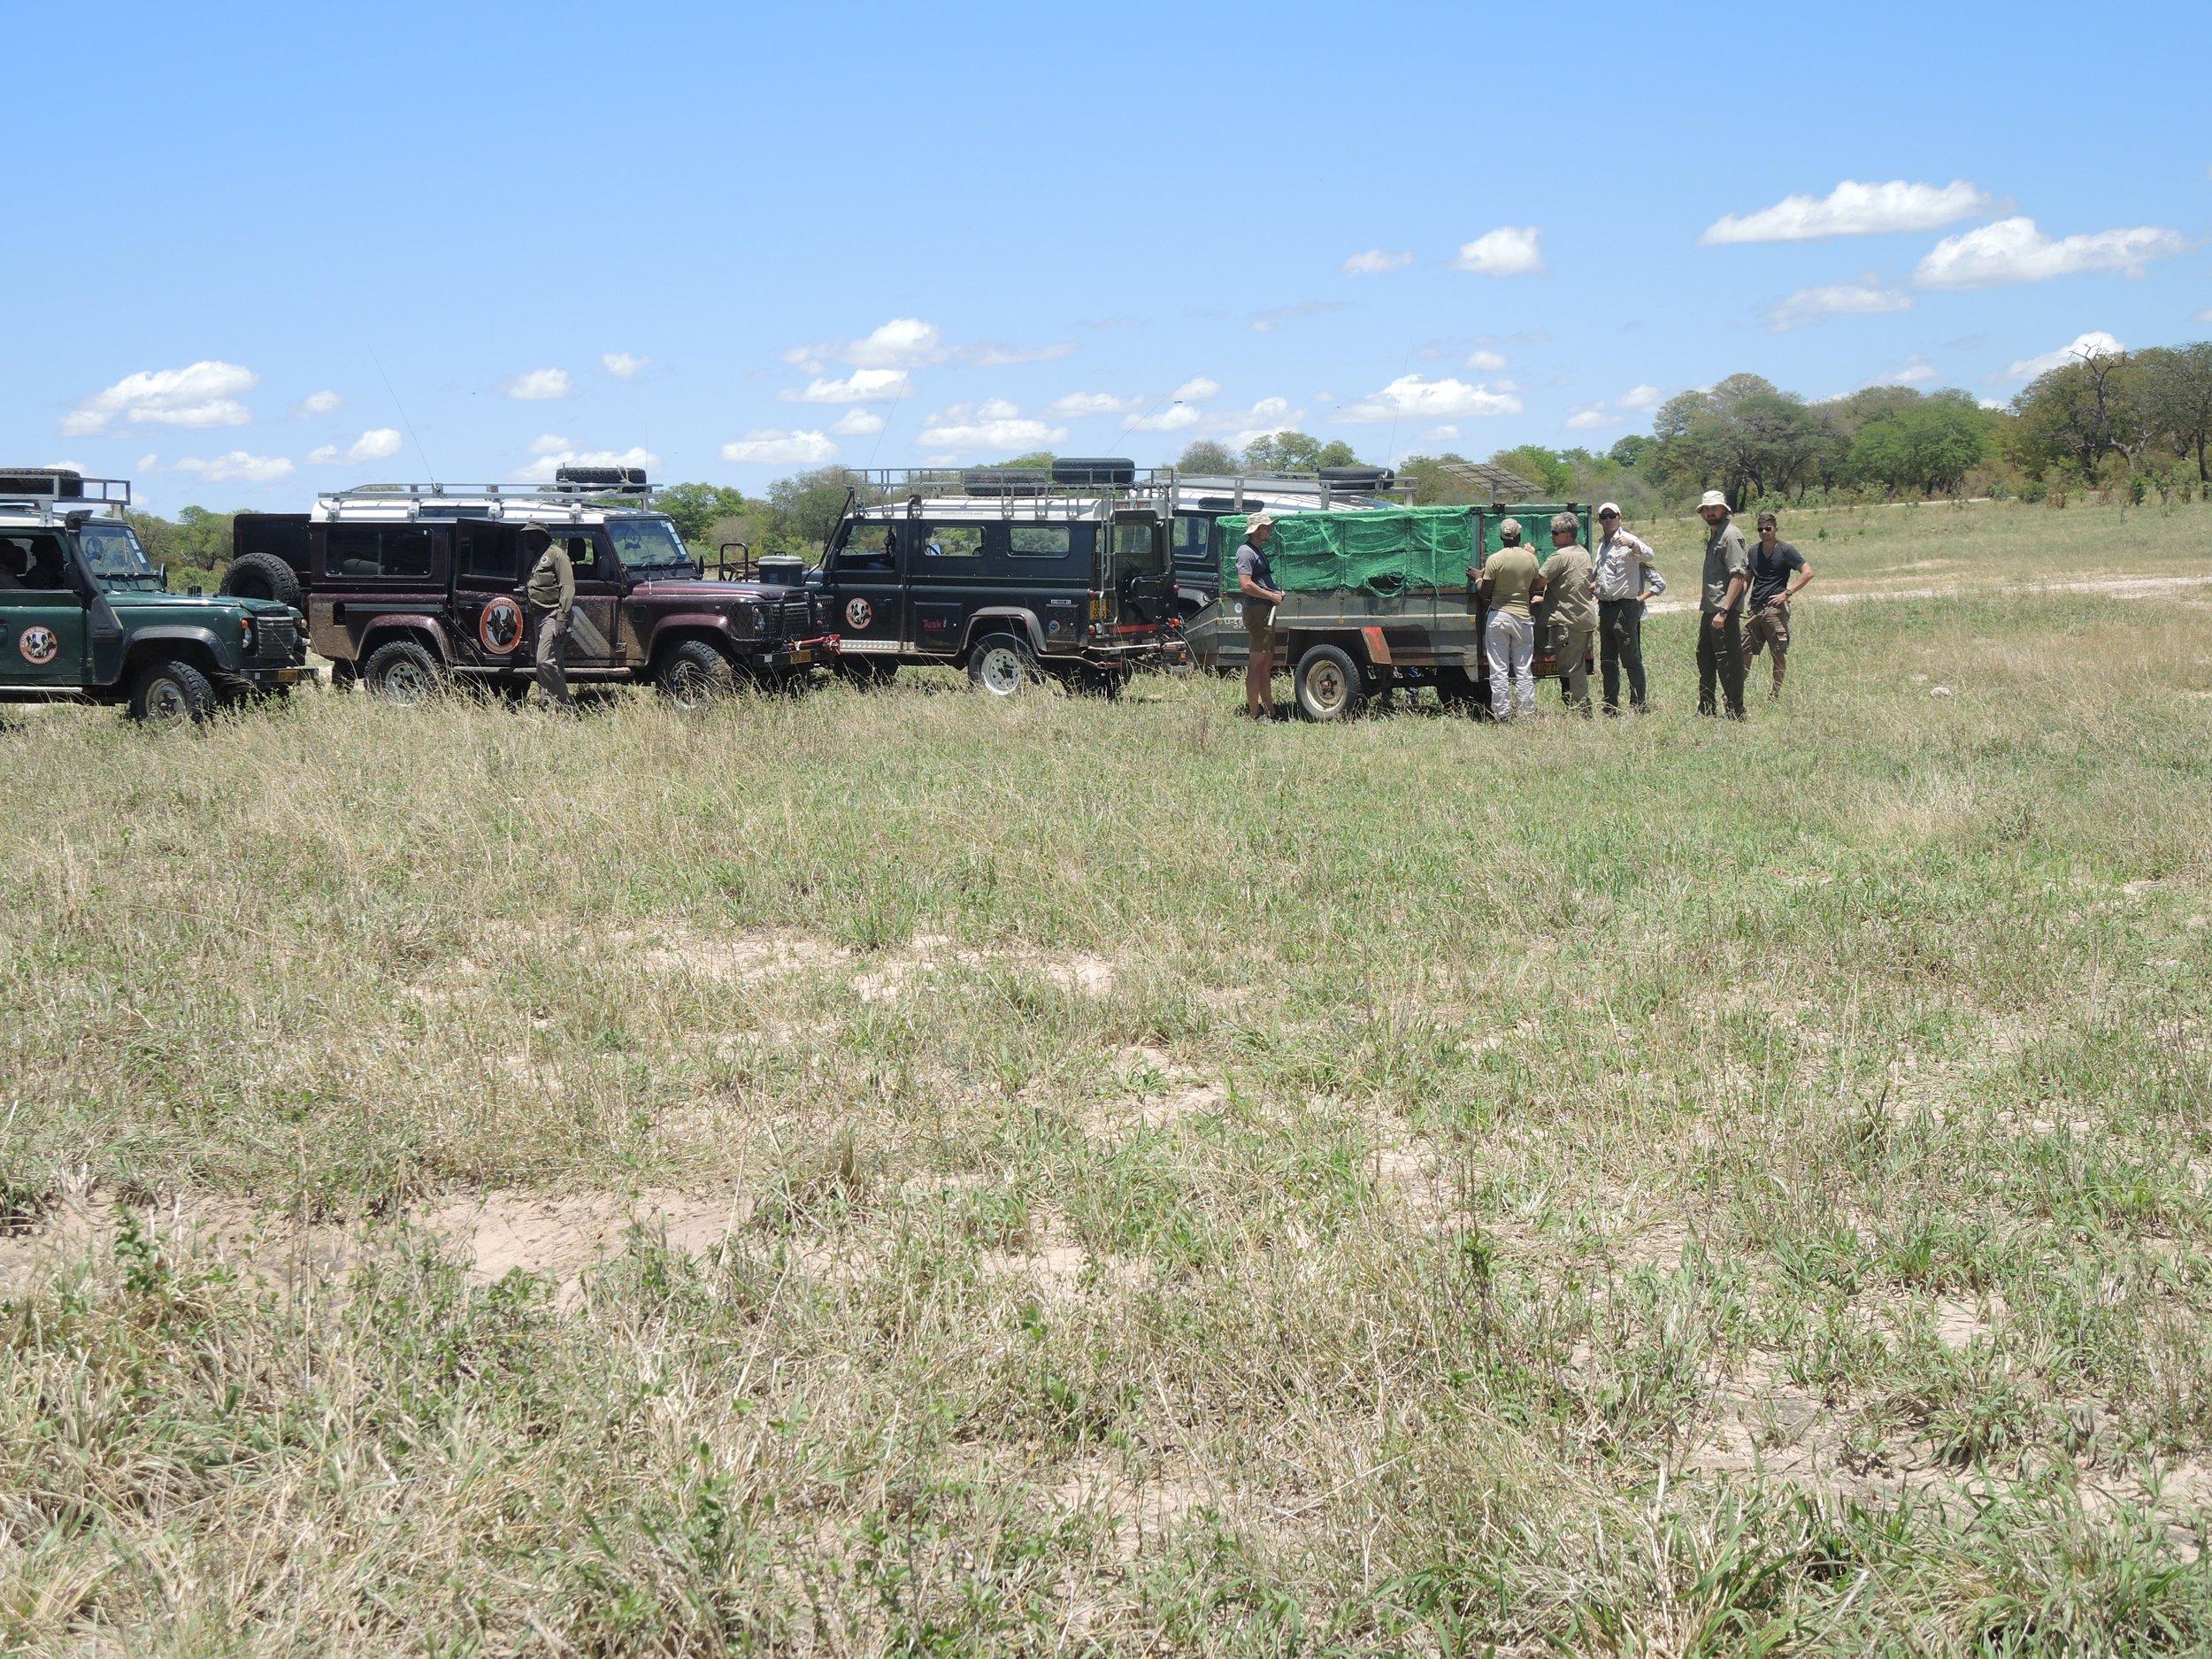 Releasing the Mpindo pack at Jambili pan inside Hwange National Park: December 2018